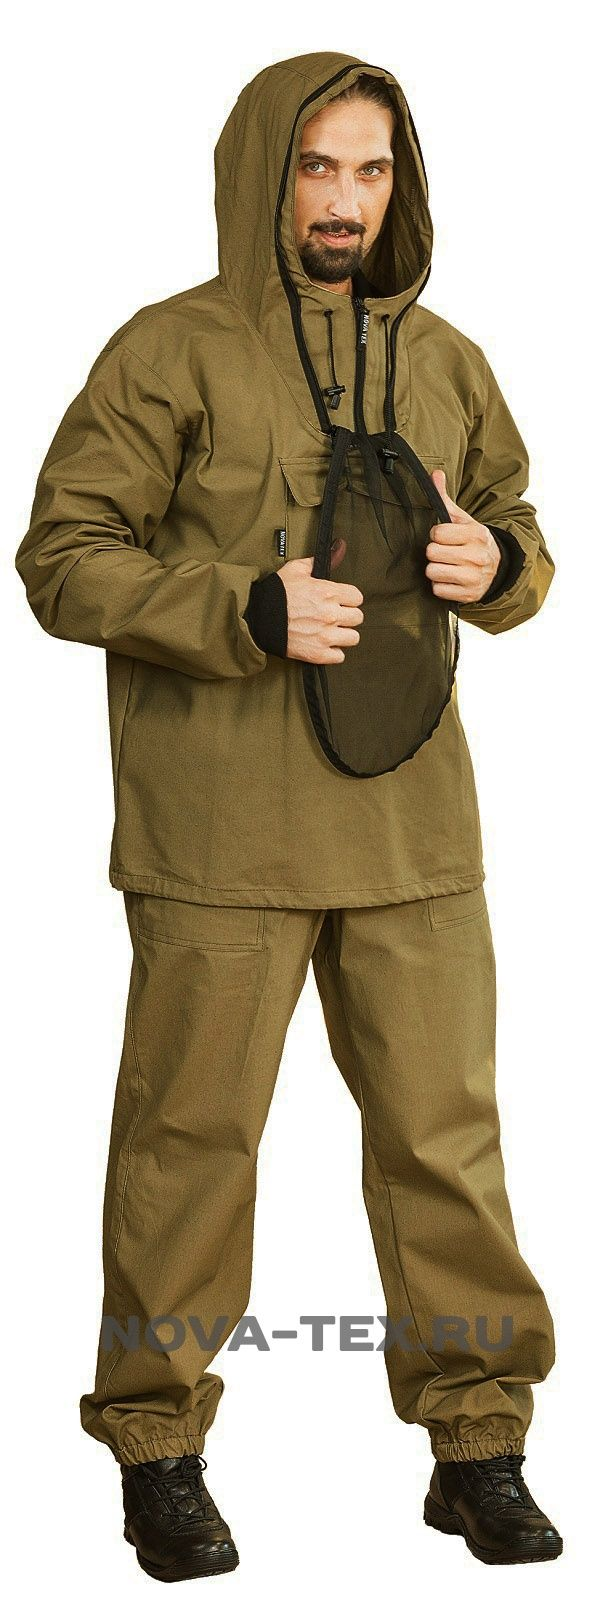 Противоэнцефалитный костюм (палатка, темн. хаки) КВЕСТ